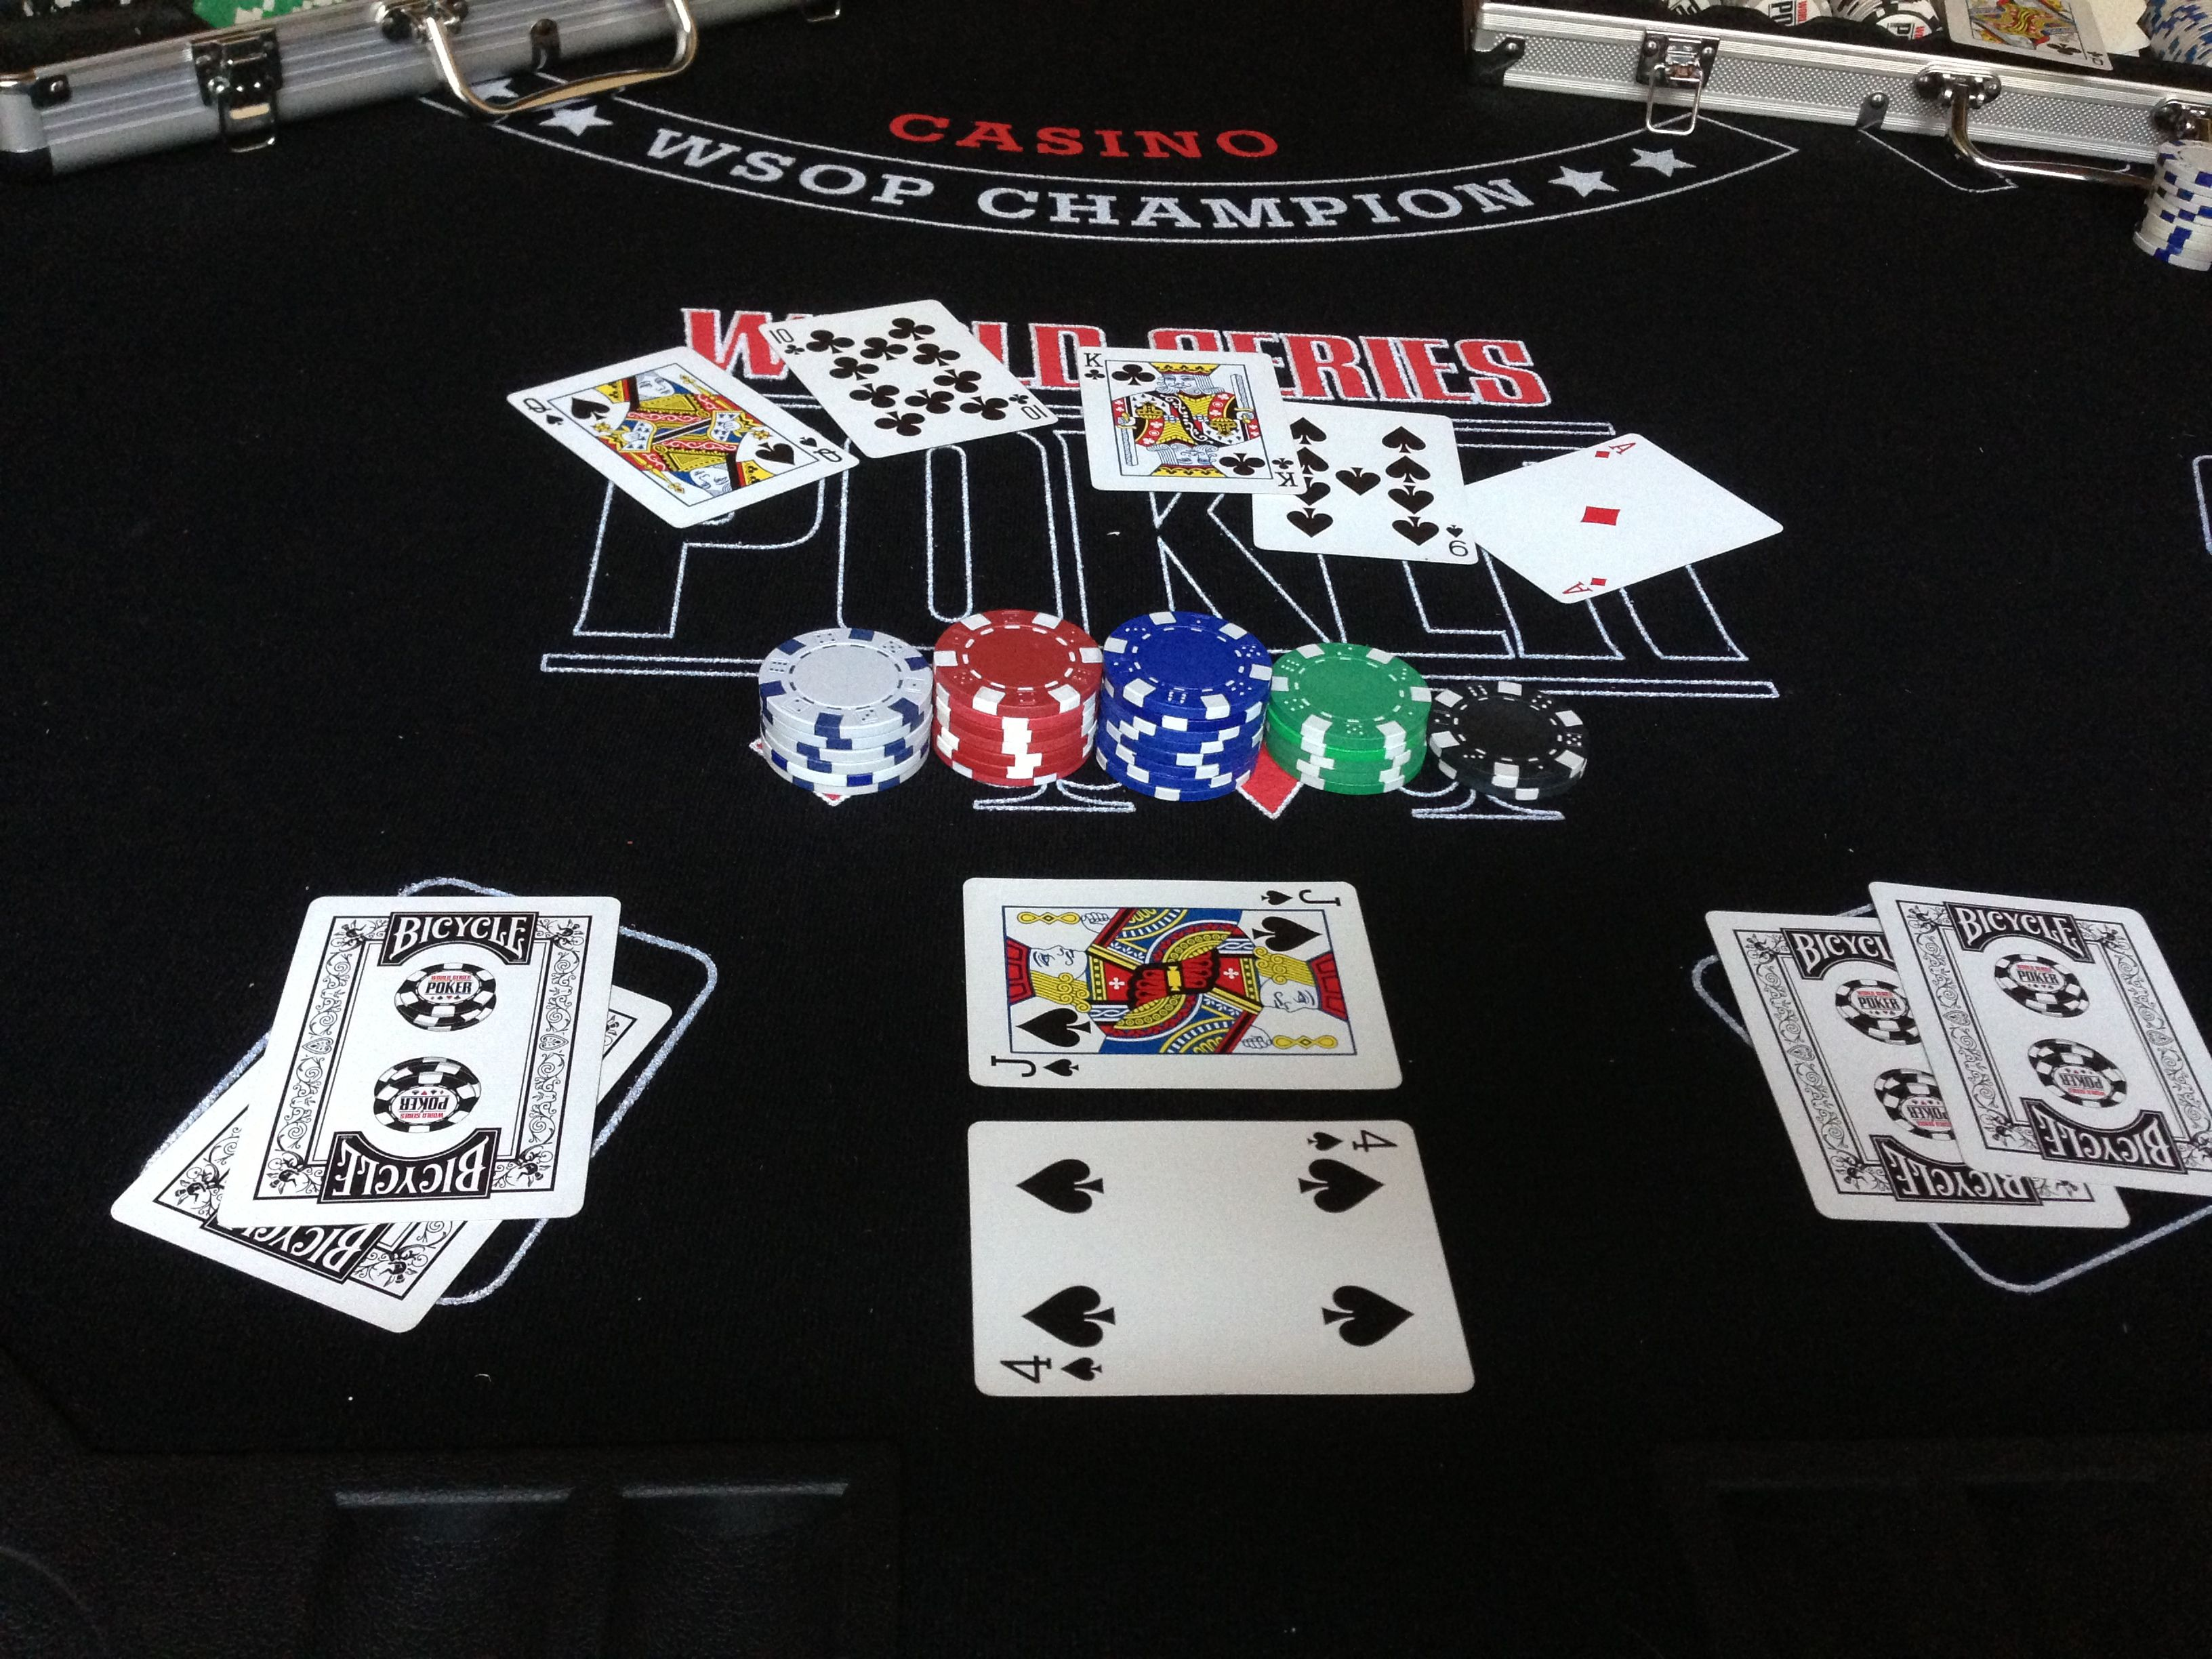 Argosy casino kansas city entertainment